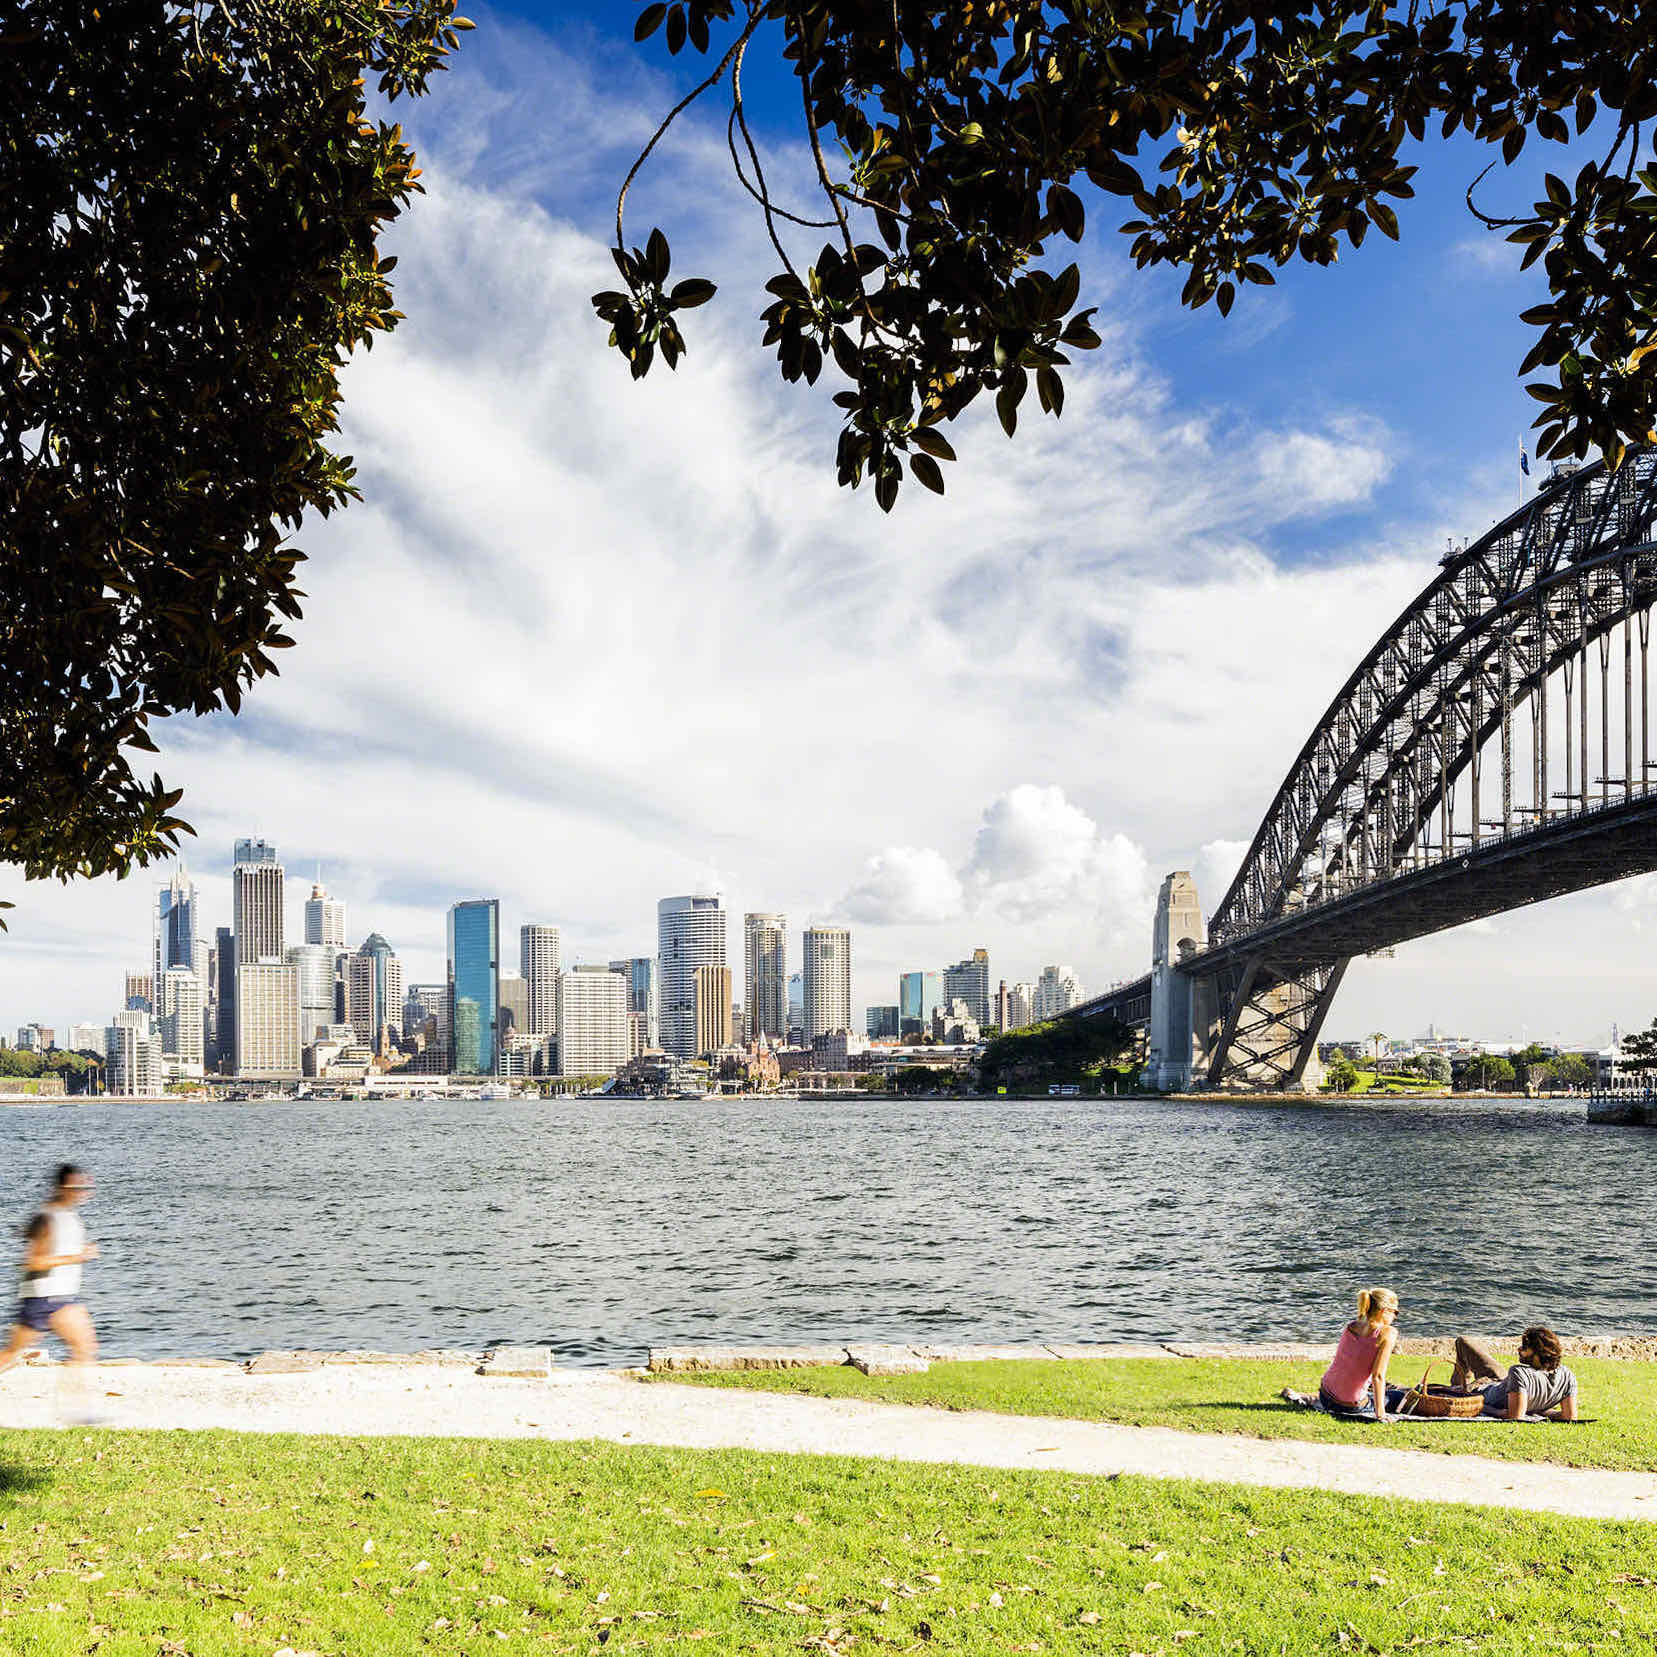 sq-sydney-harbour-picnic-at-kirribilli-park-steve-back-destinationNSW-photo-credit